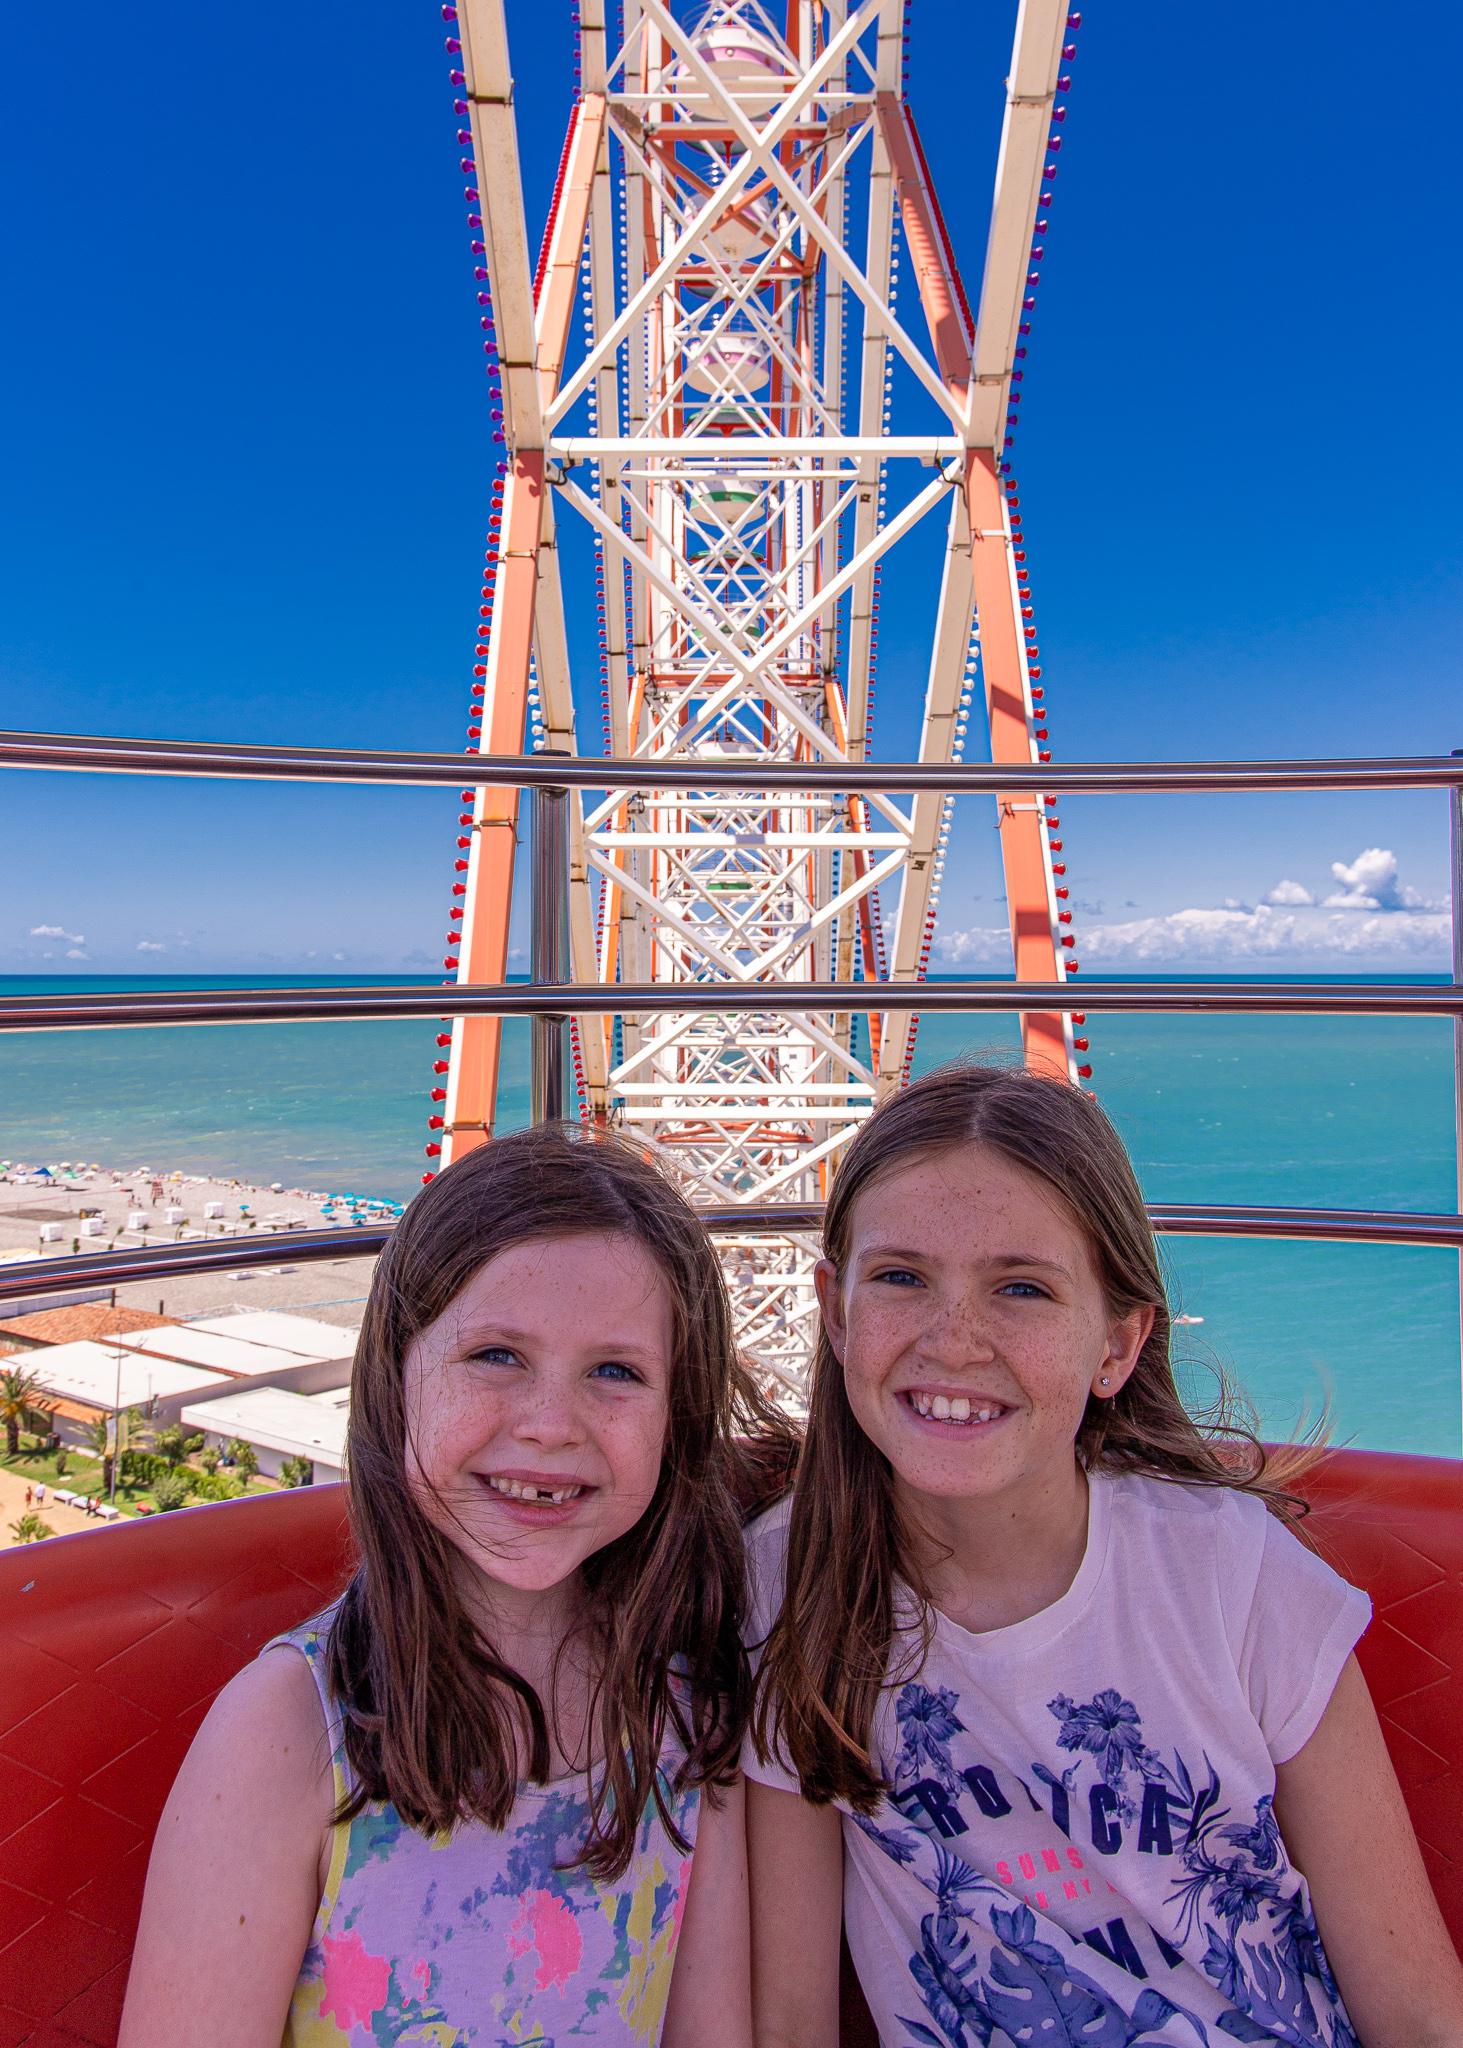 The girls loving their Ferris Wheel experience